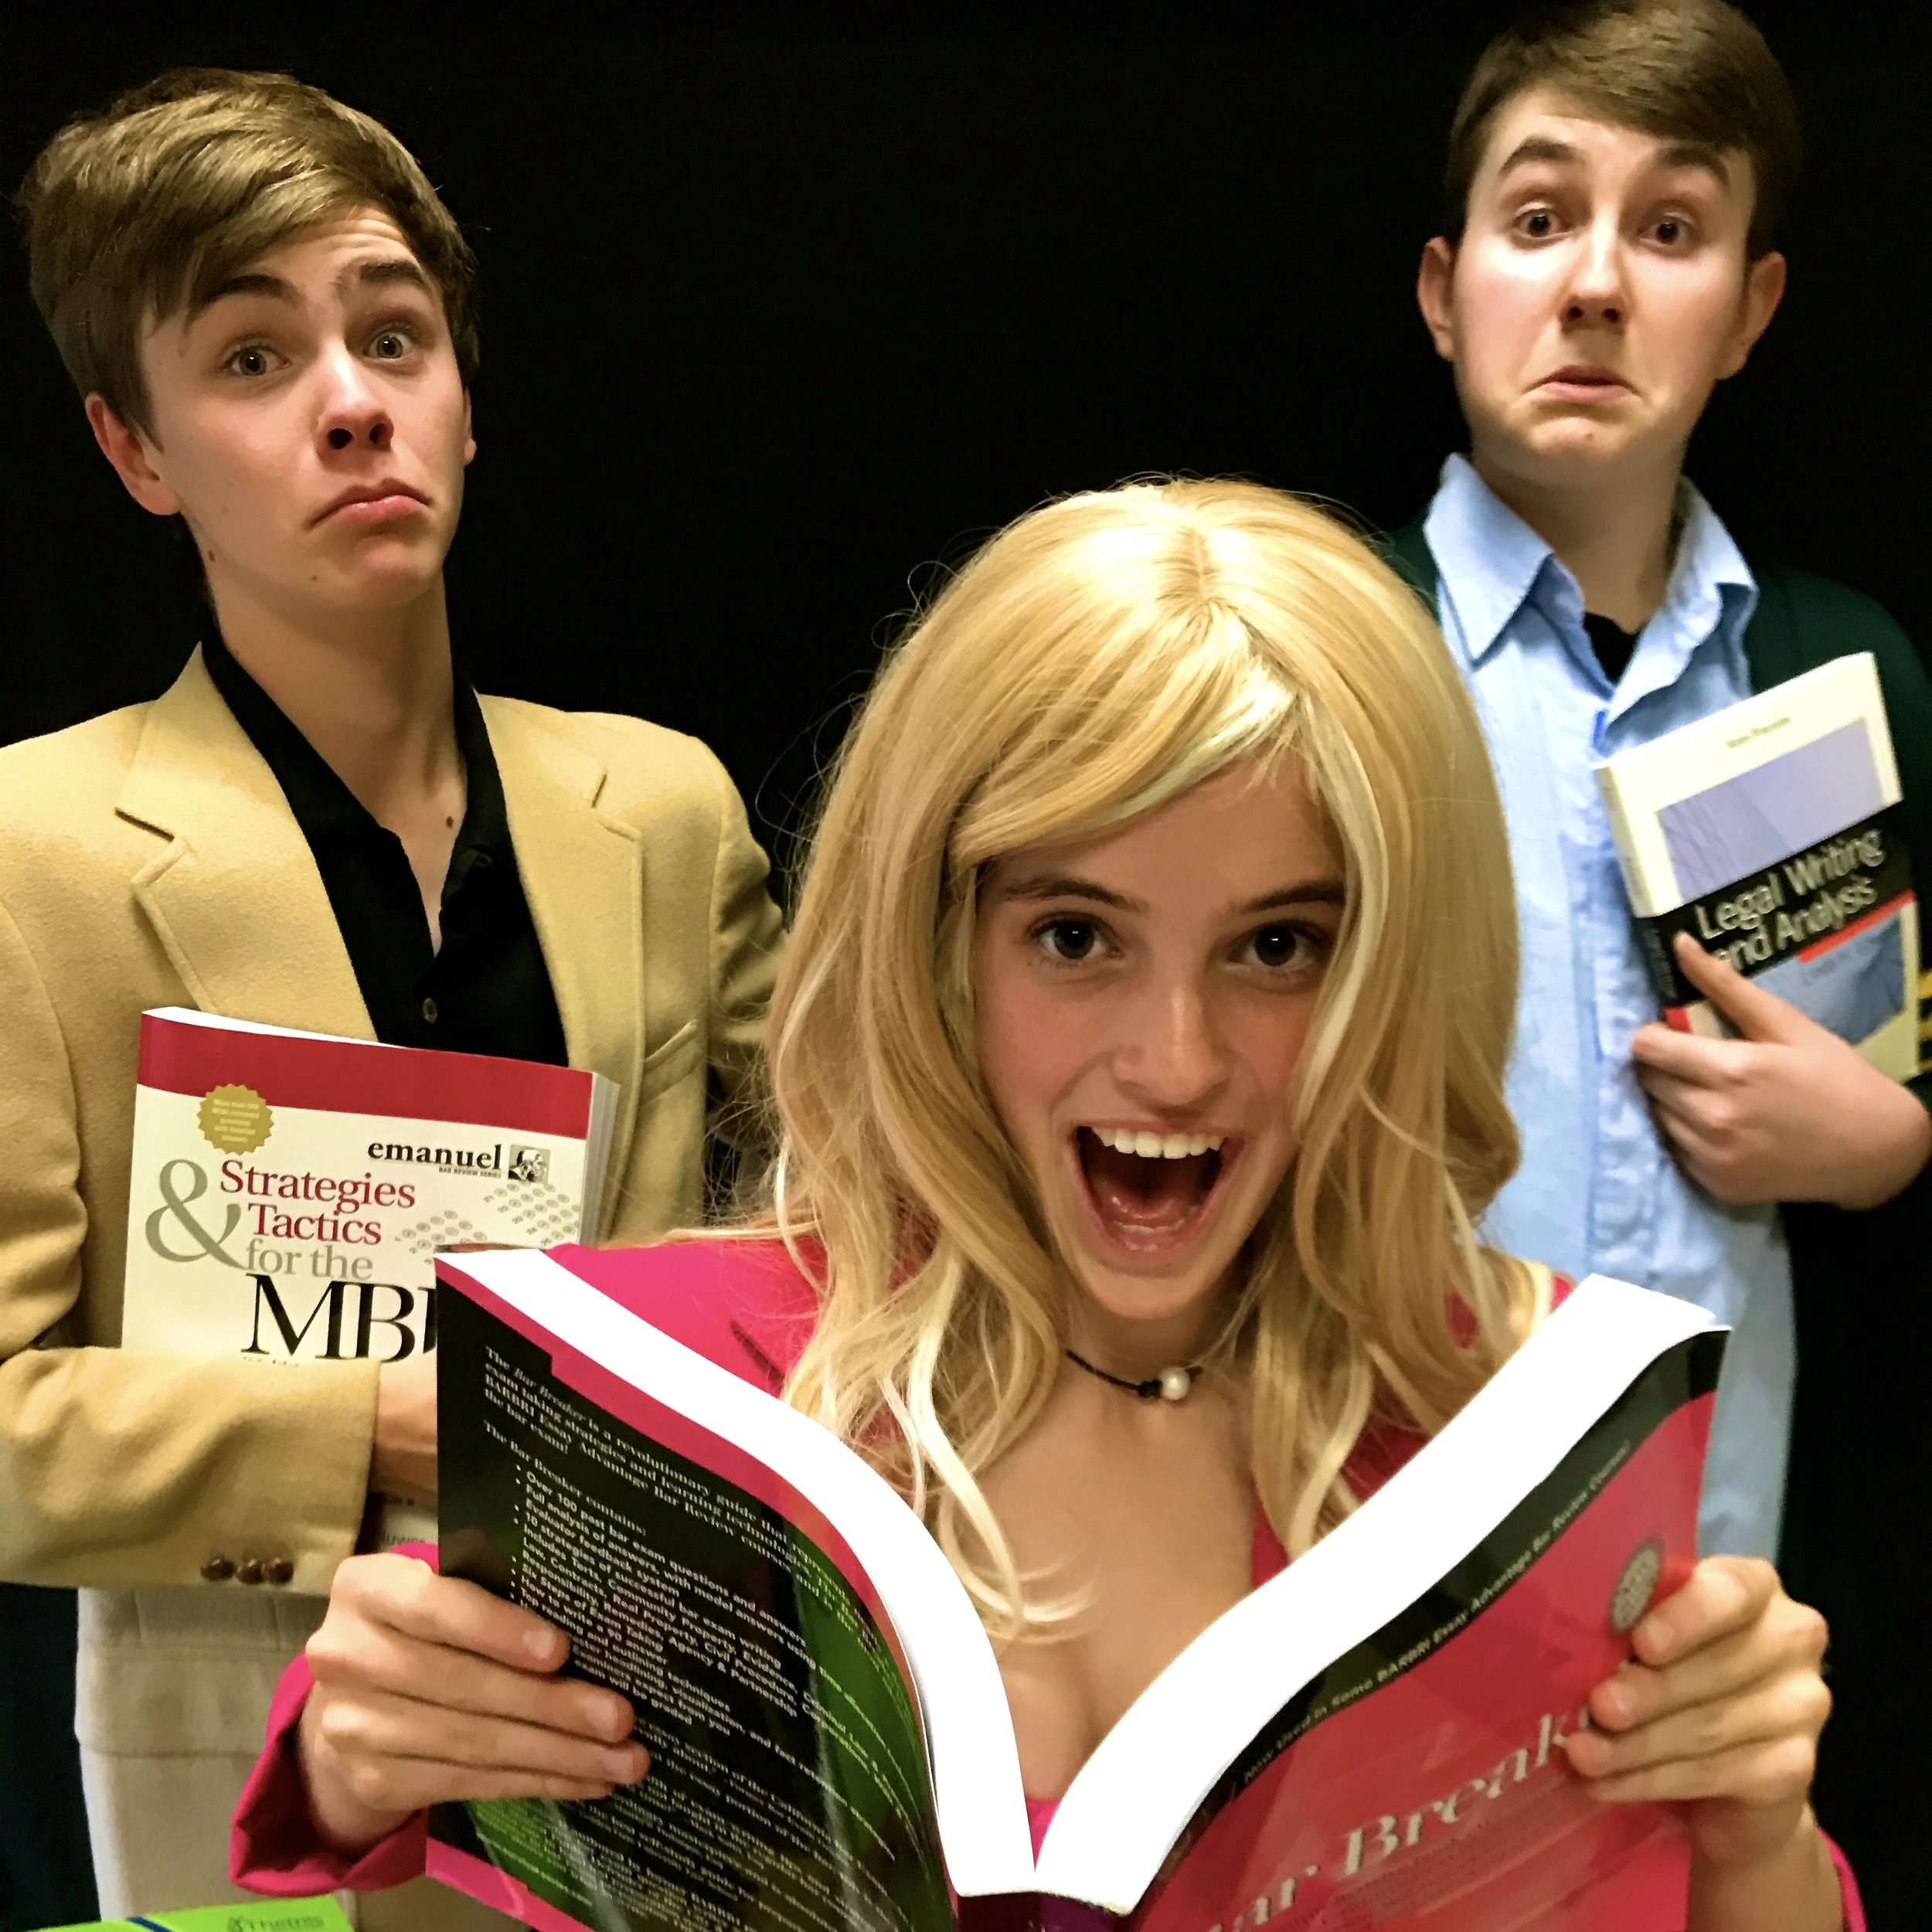 L to R: Morgan Hunt as Emmett, Jordan Paff as Elle Woods, Matthew Peterson as Warner